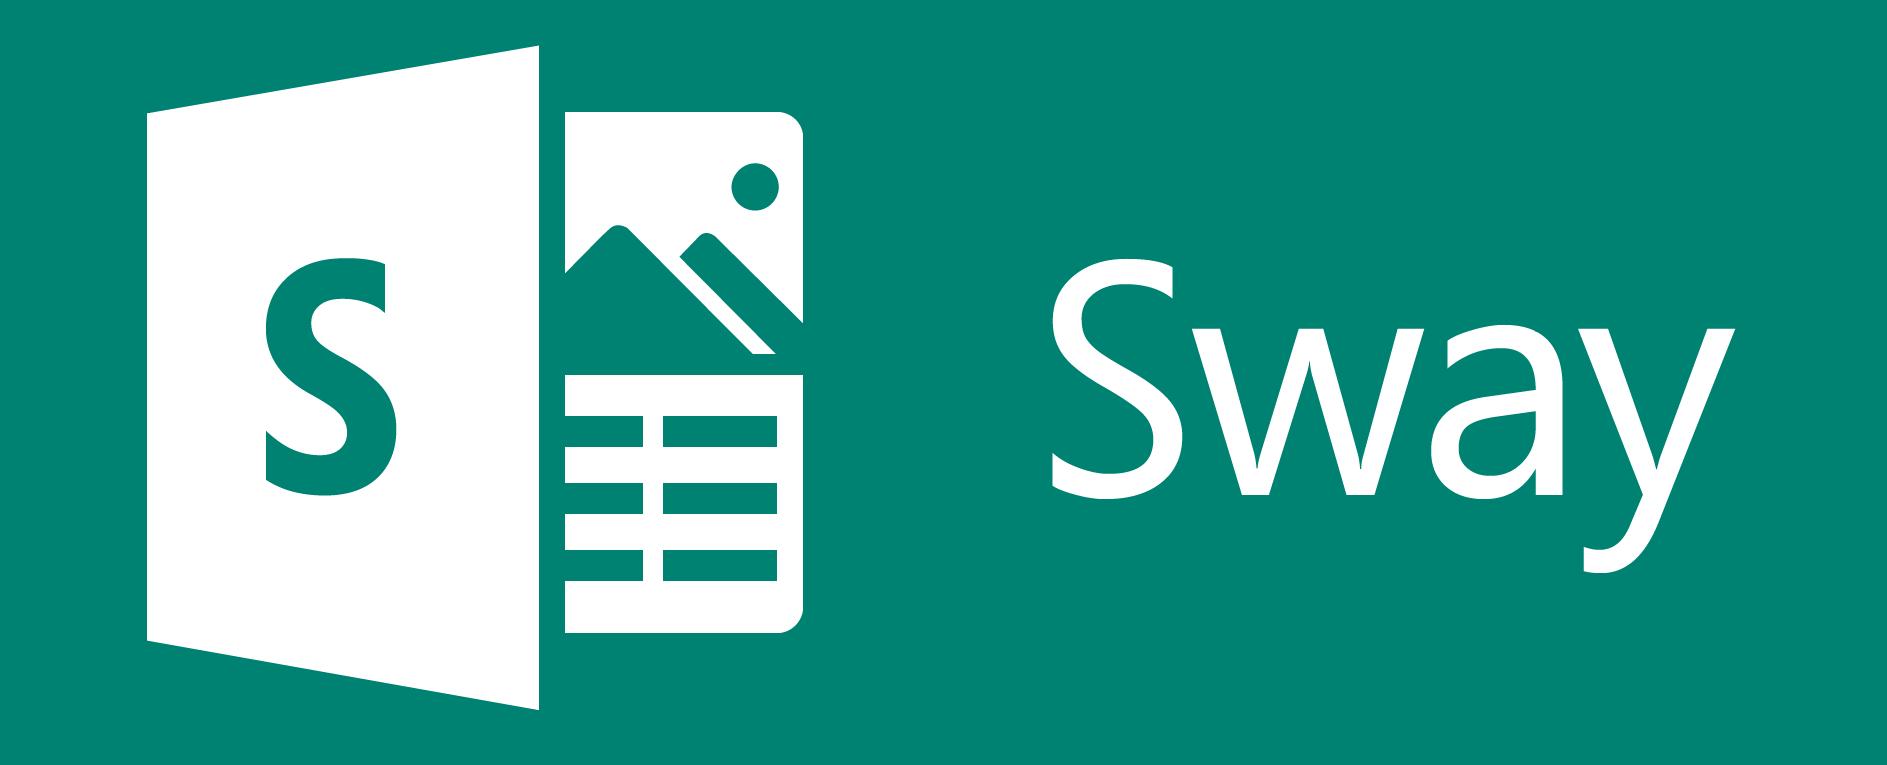 Microsoft ukončuje aplikaci Office Sway pro iOS